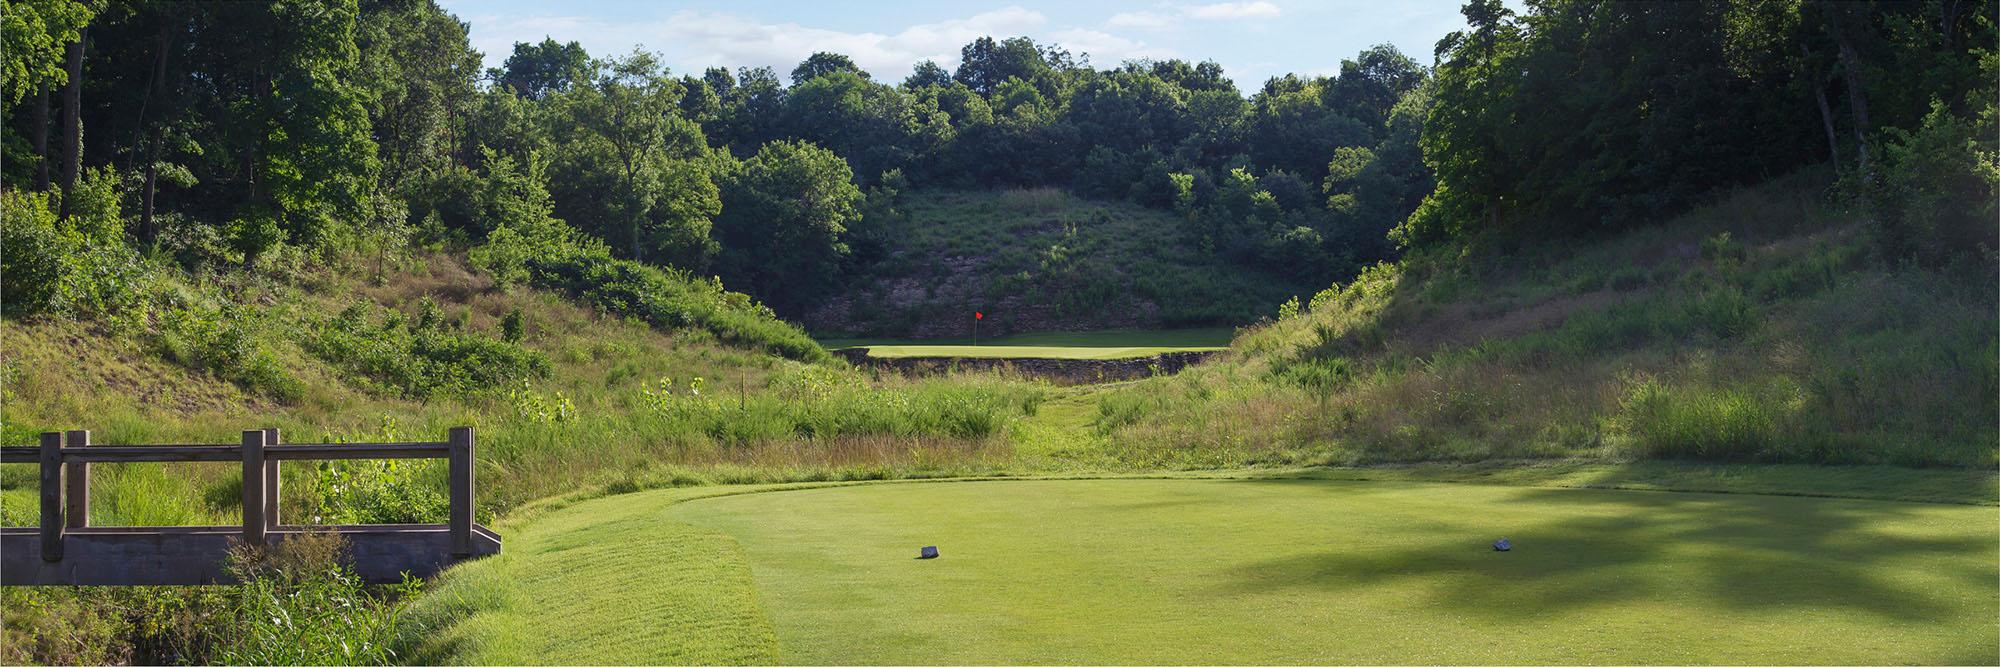 Golf Course Image - Patriot No. 6A